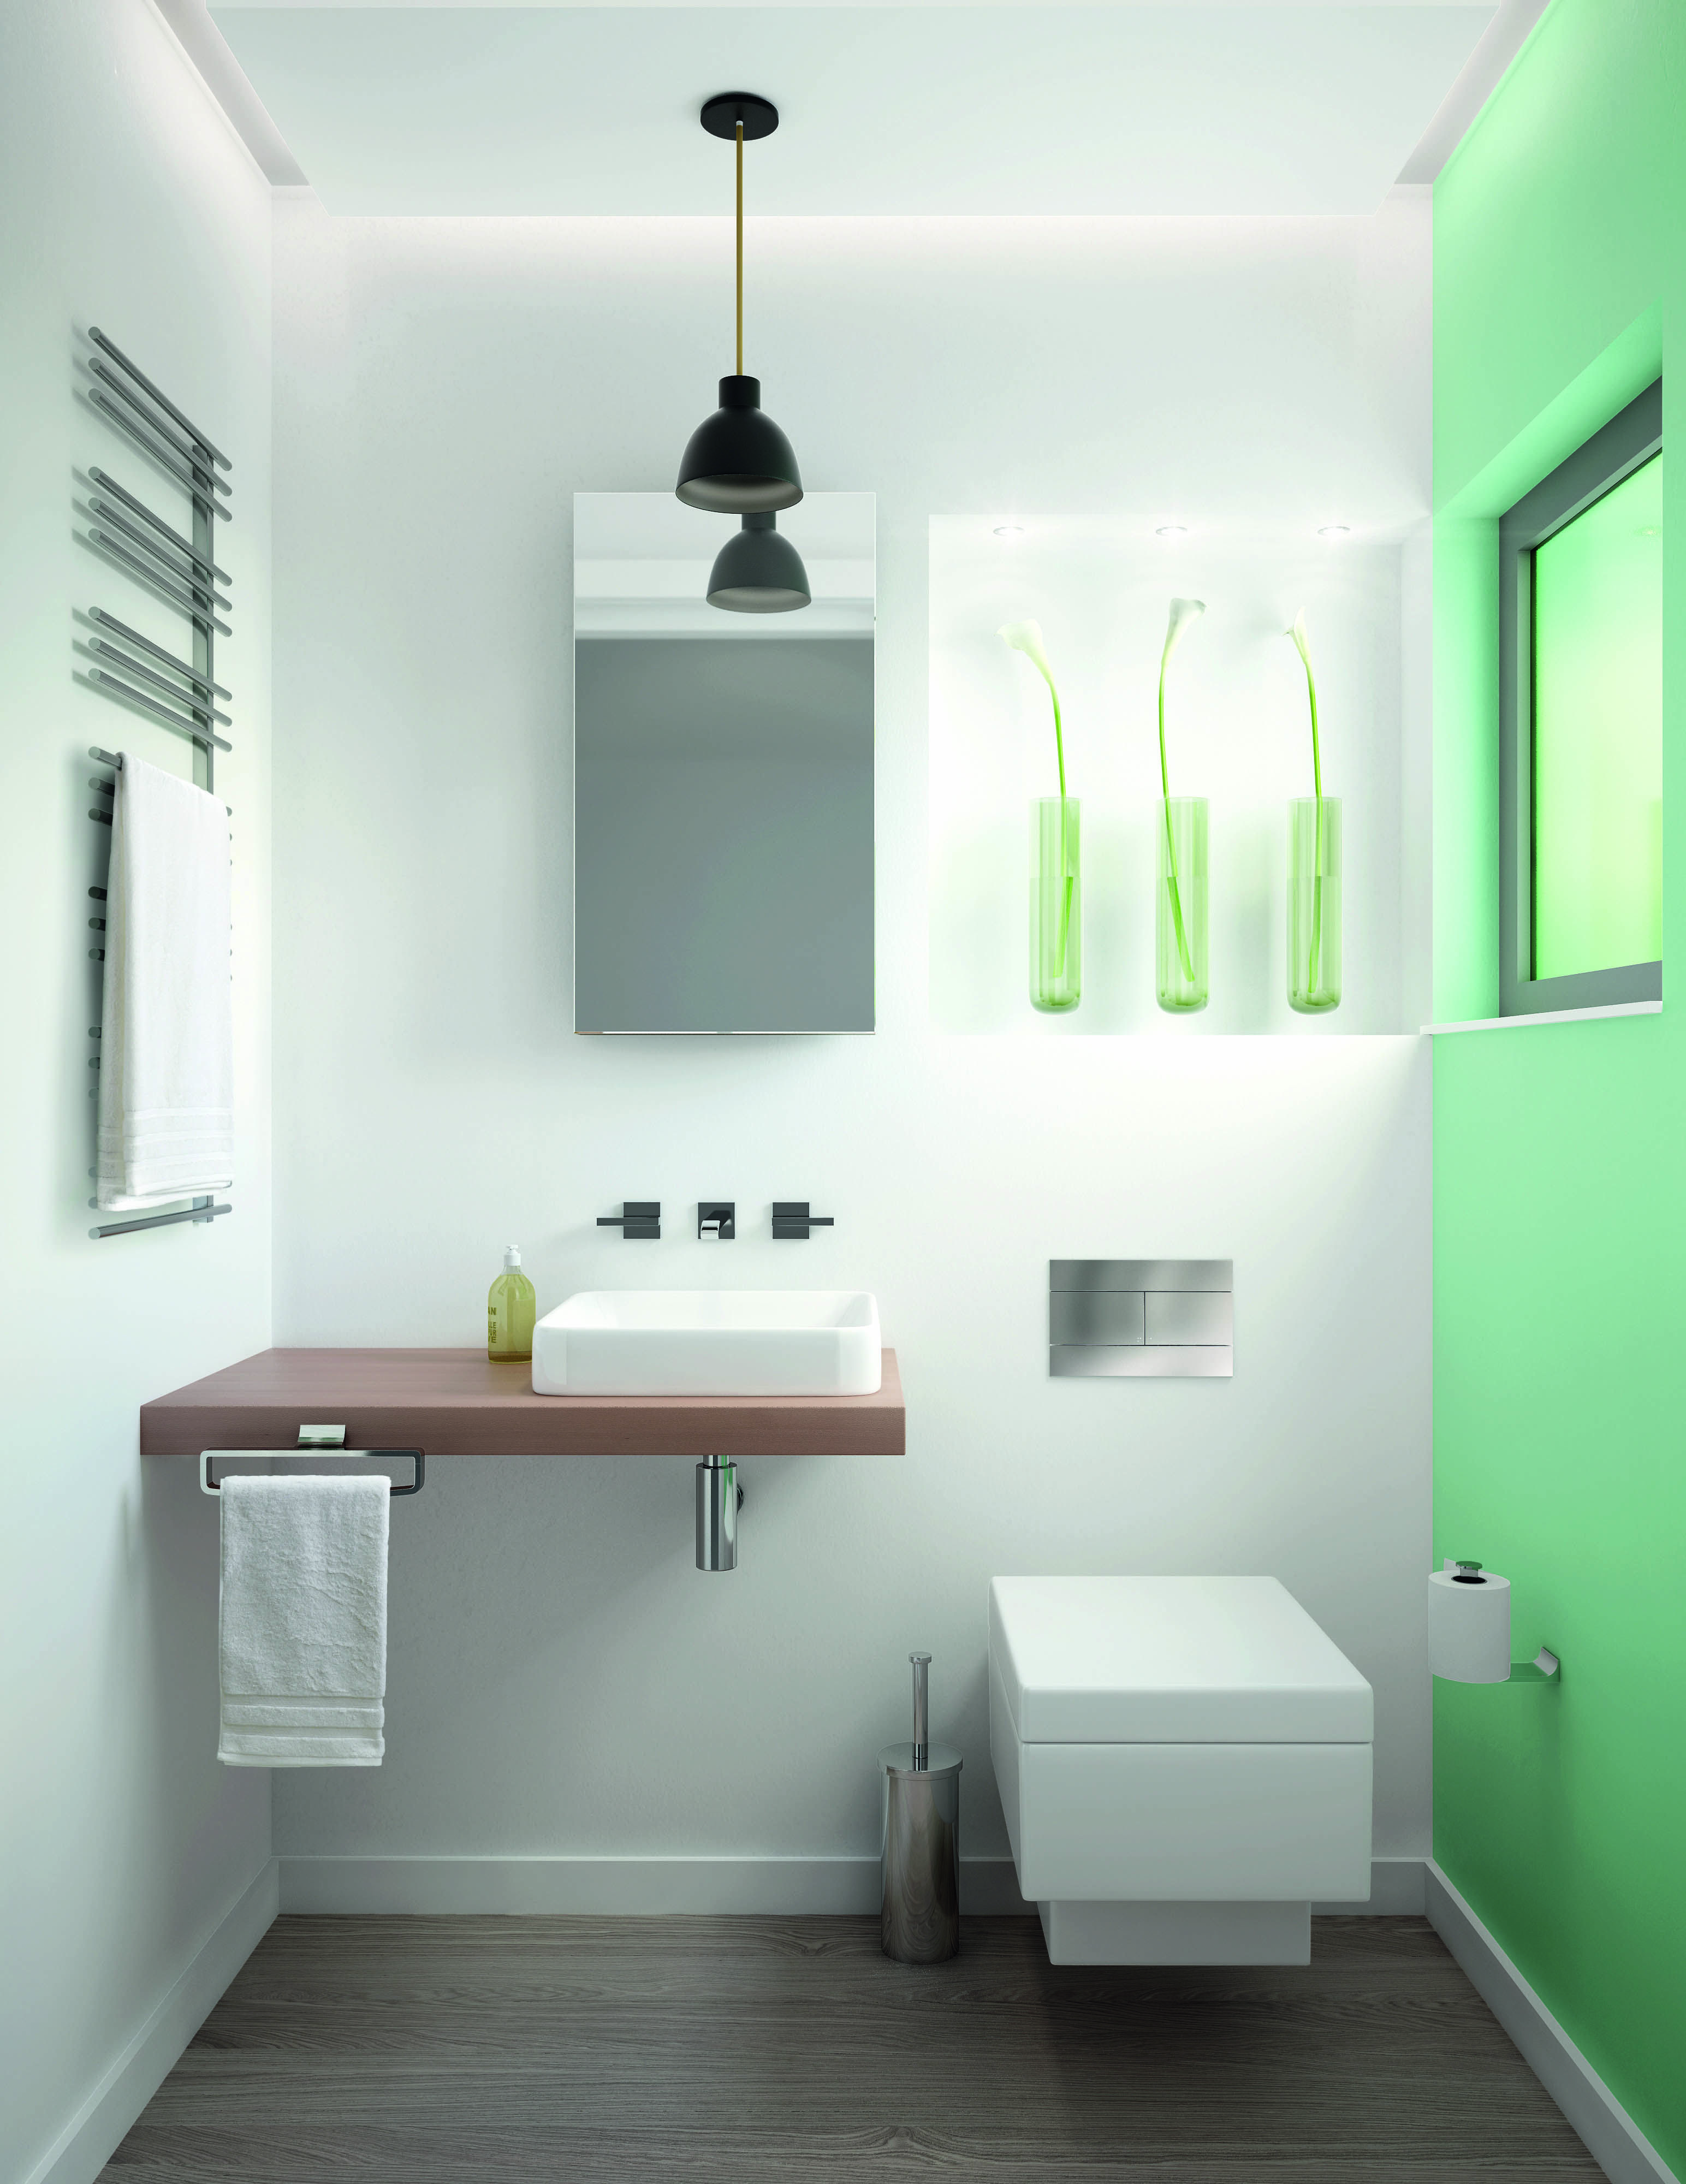 Kohler Bathrooms | Bathrooms | Pinterest | Kohler bathroom